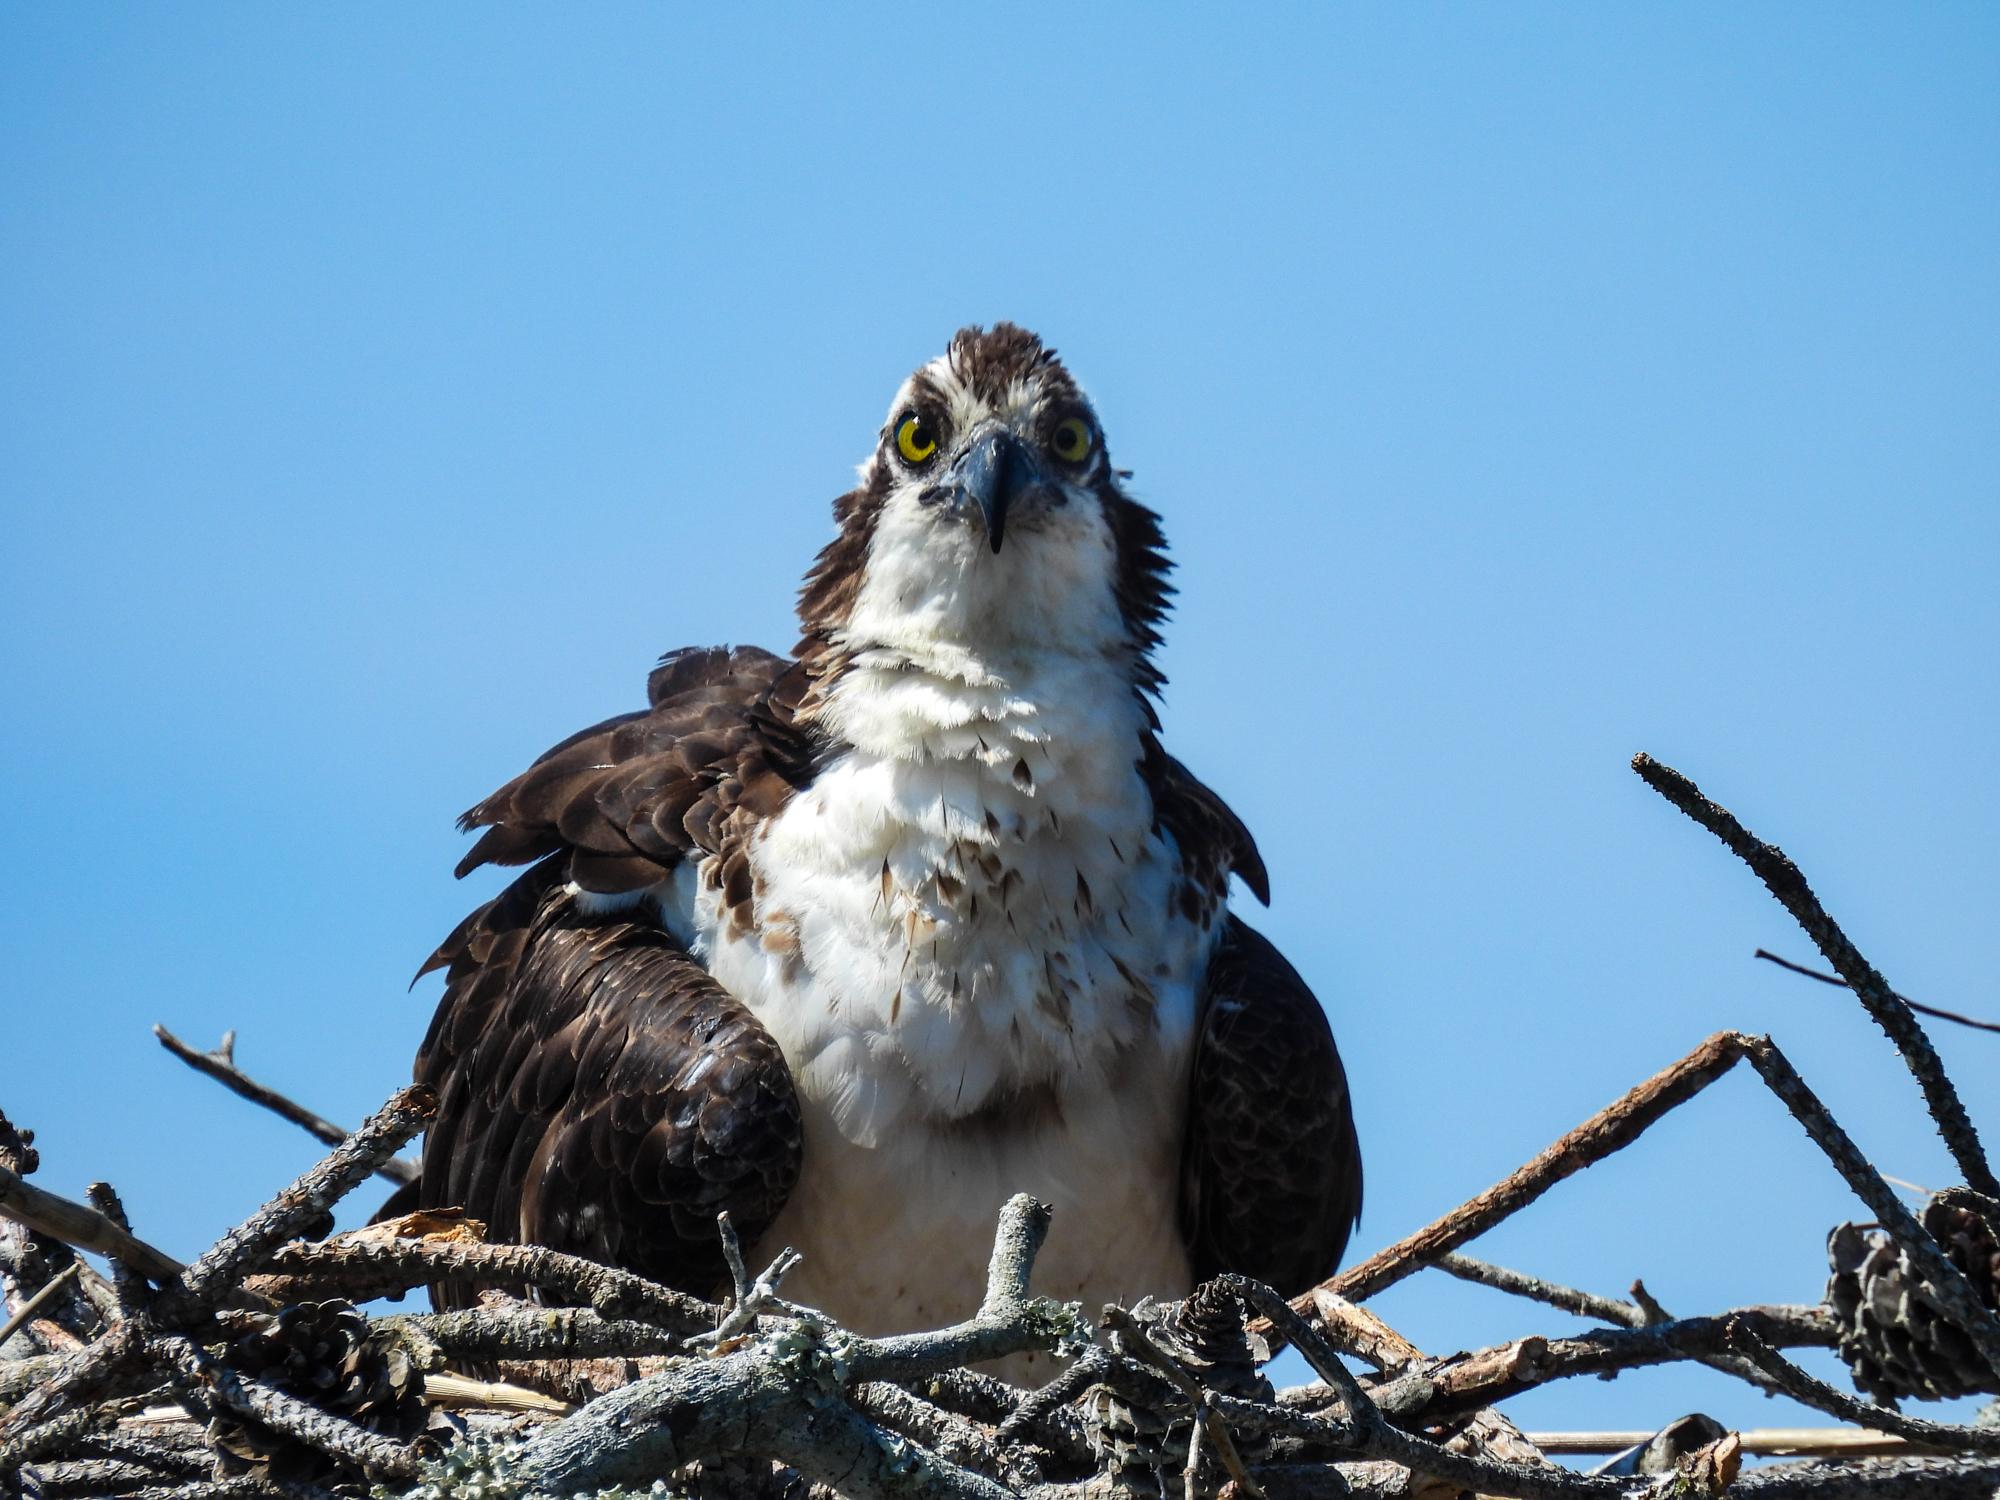 Ospreys hatch 3 chicks beginning on Mother's Day!